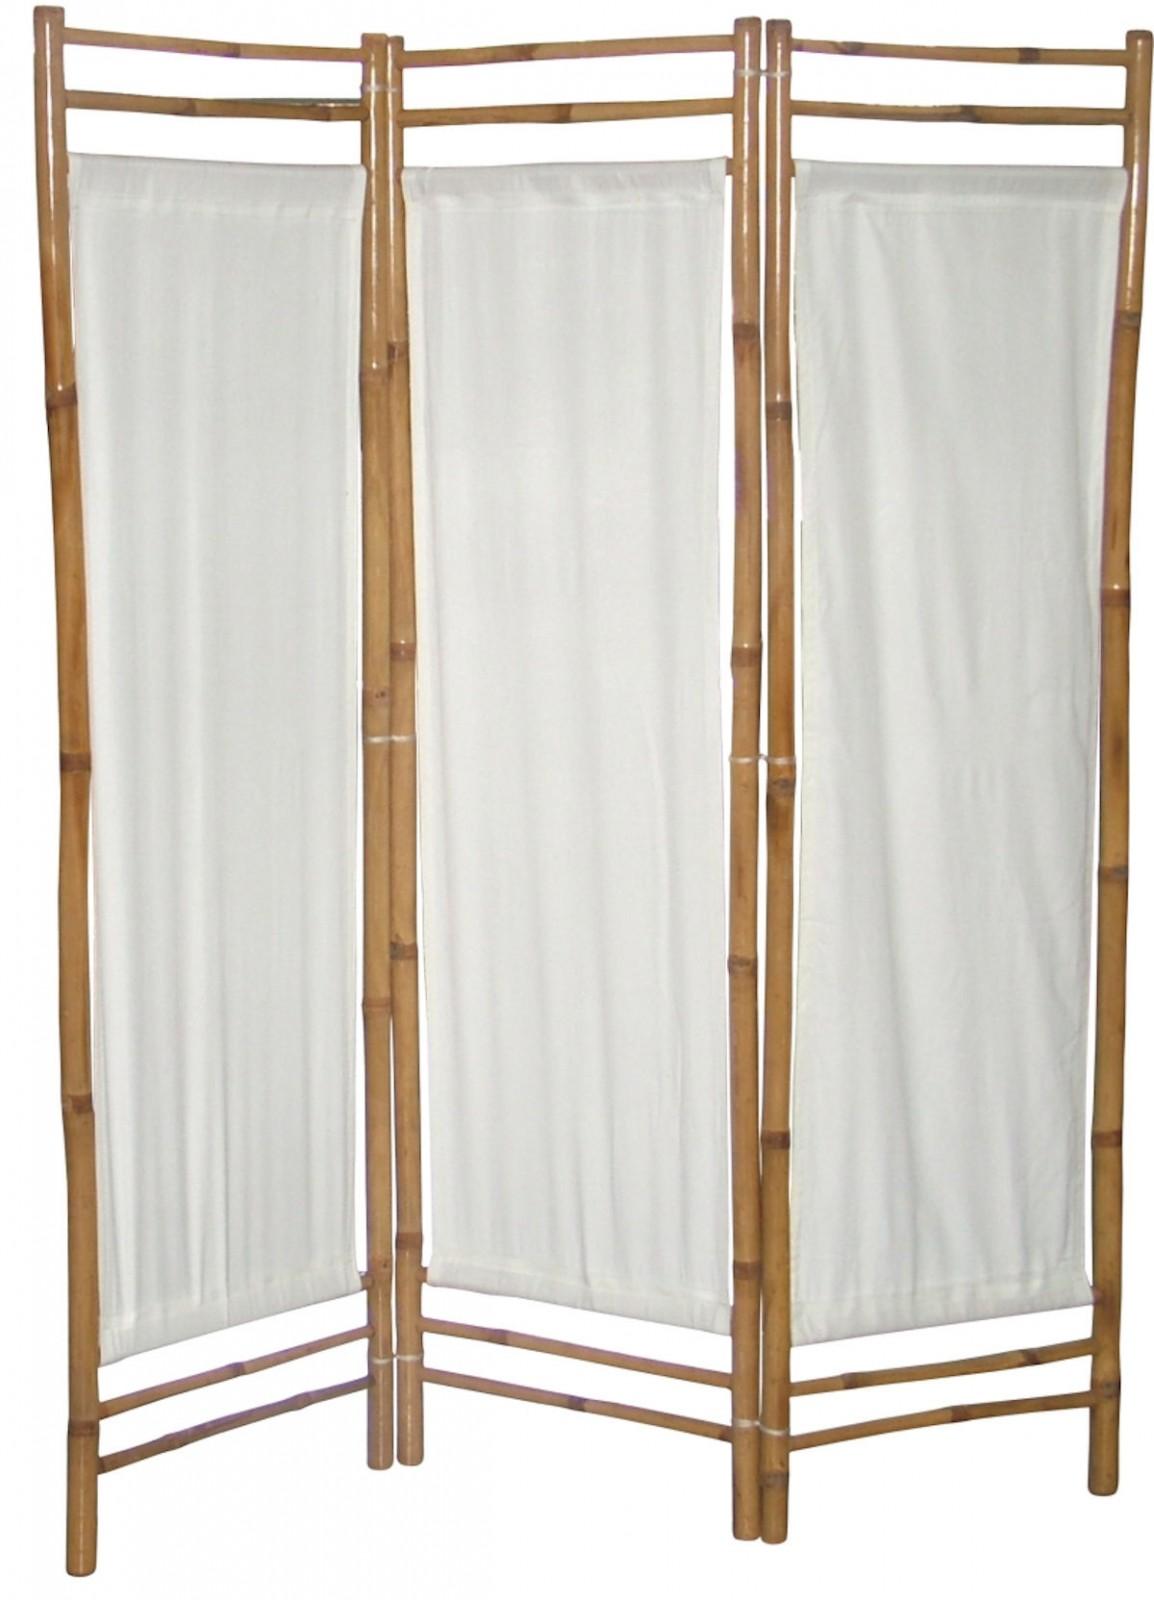 Full Size of Paravent Bambus Raumteile 3 45 Cm H 160 Garten Bett Wohnzimmer Paravent Bambus